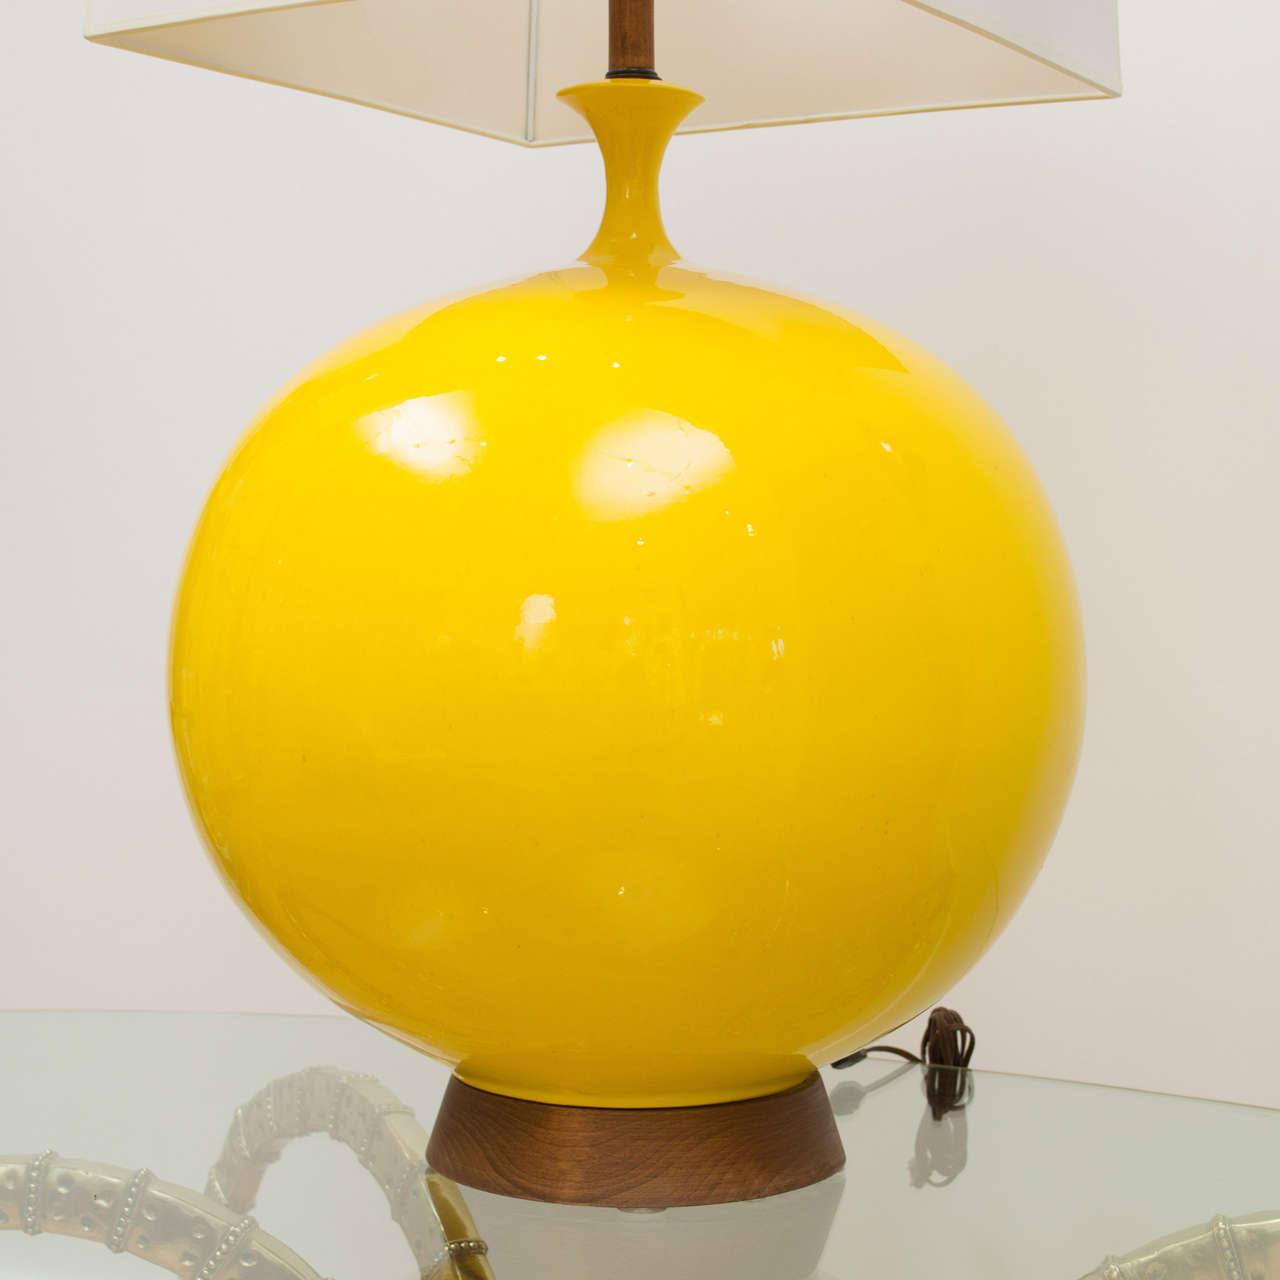 Mid century ginger jar lamp pair at 1stdibs - Vibrant Yellow Lamp For Sale At 1stdibs